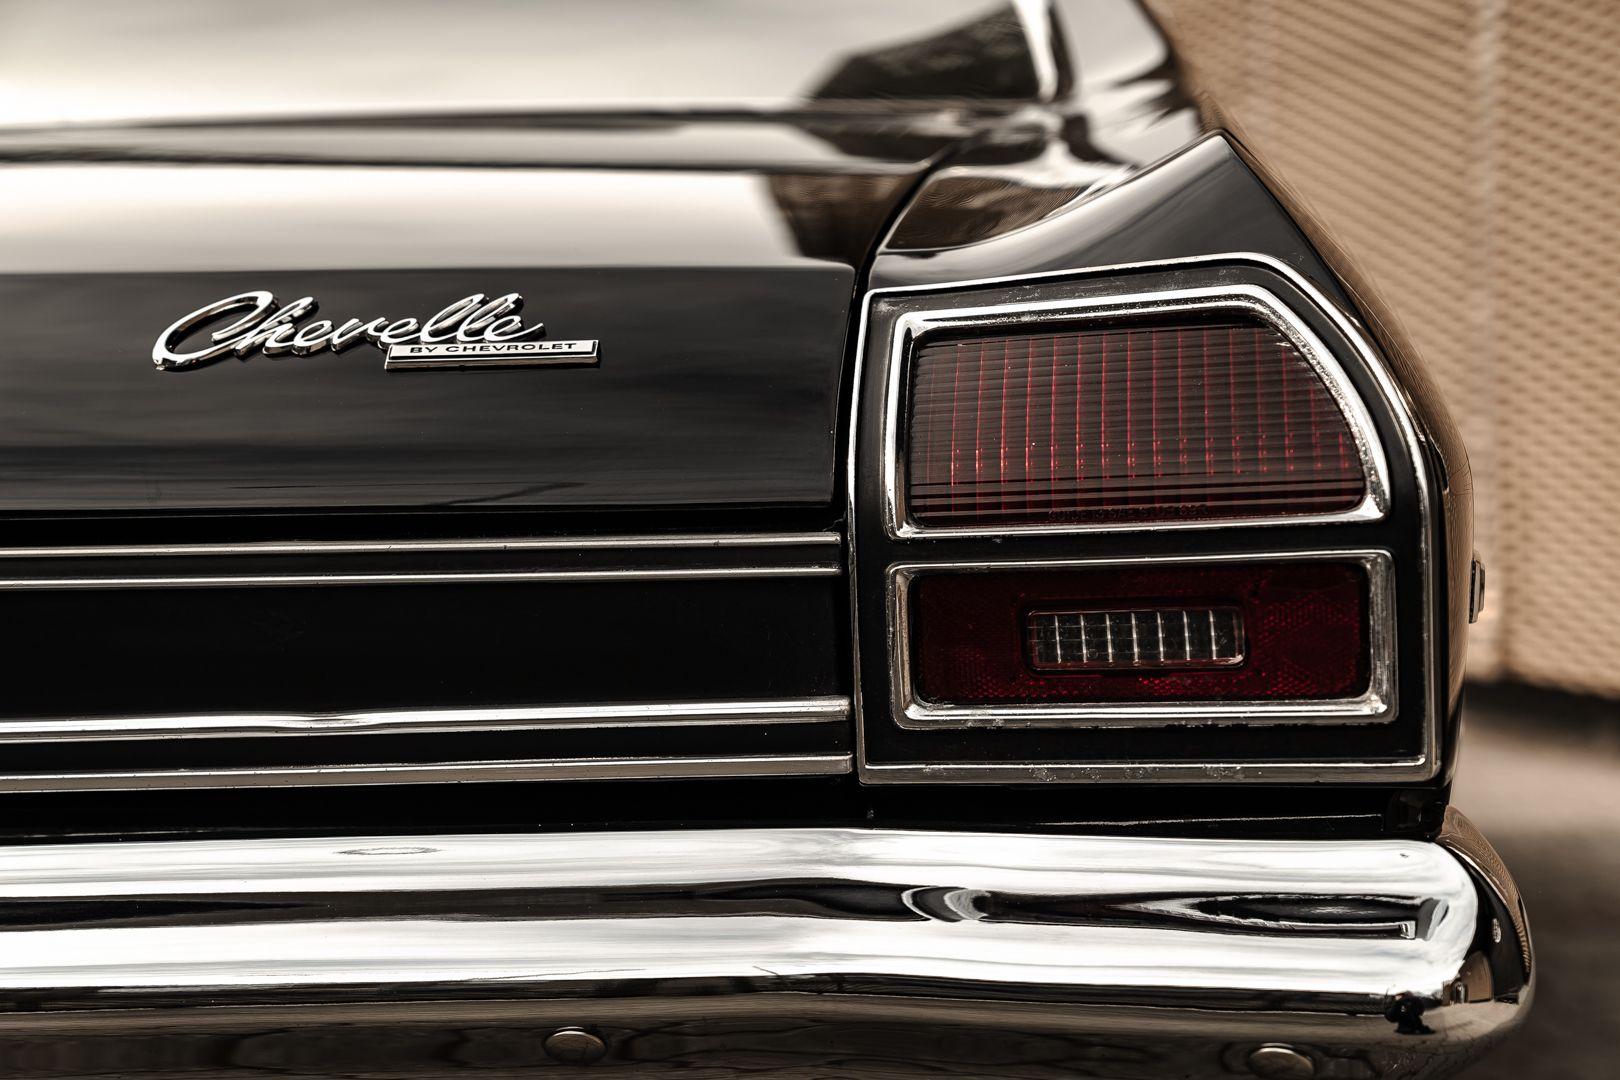 1969 Chevrolet Chevelle SS 62978